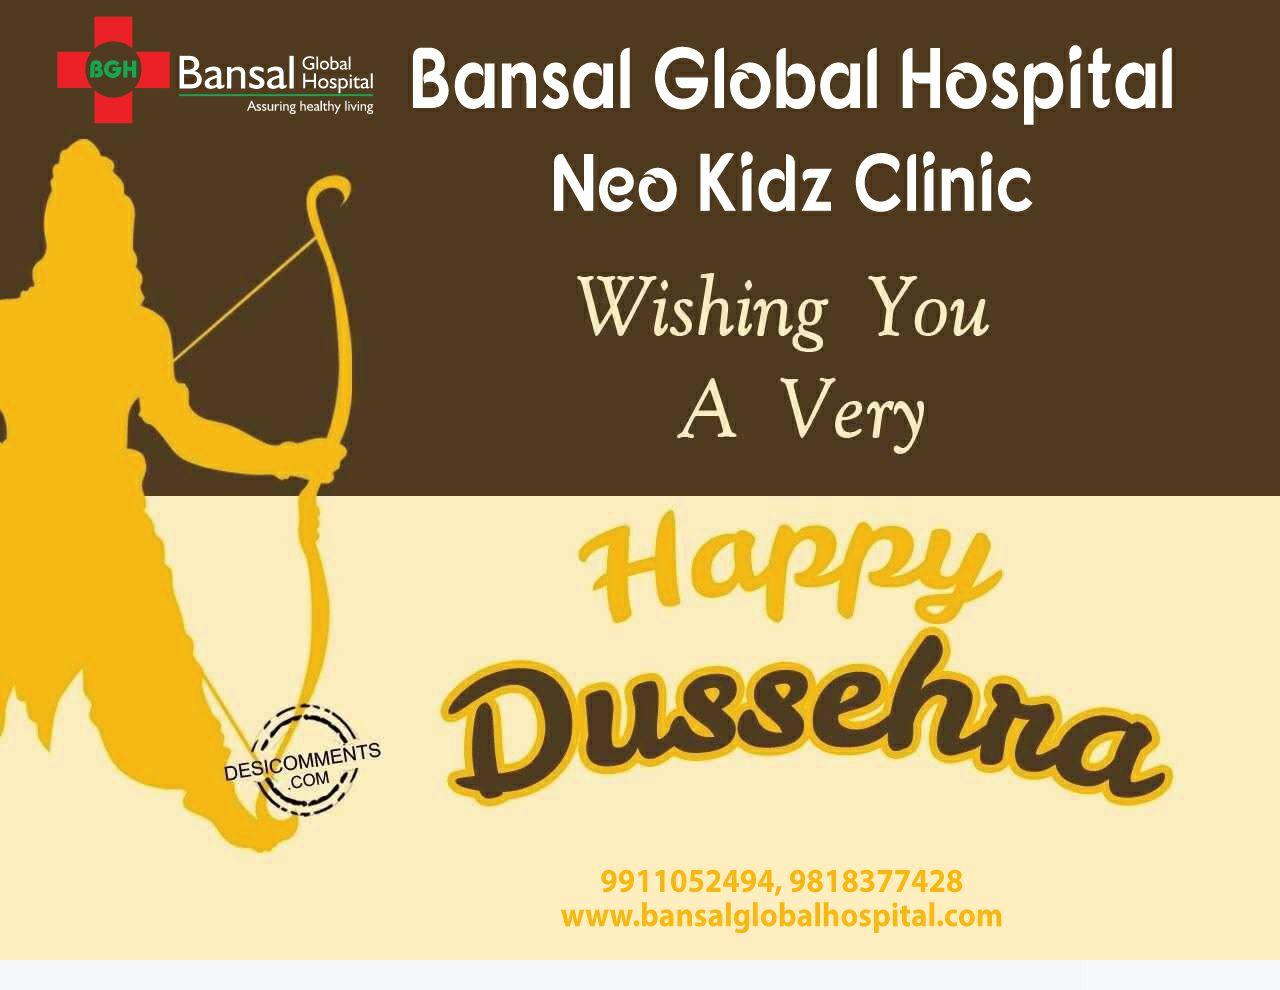 Bansal Global Hospital Neo Kidz Clinic Happy Dussehra